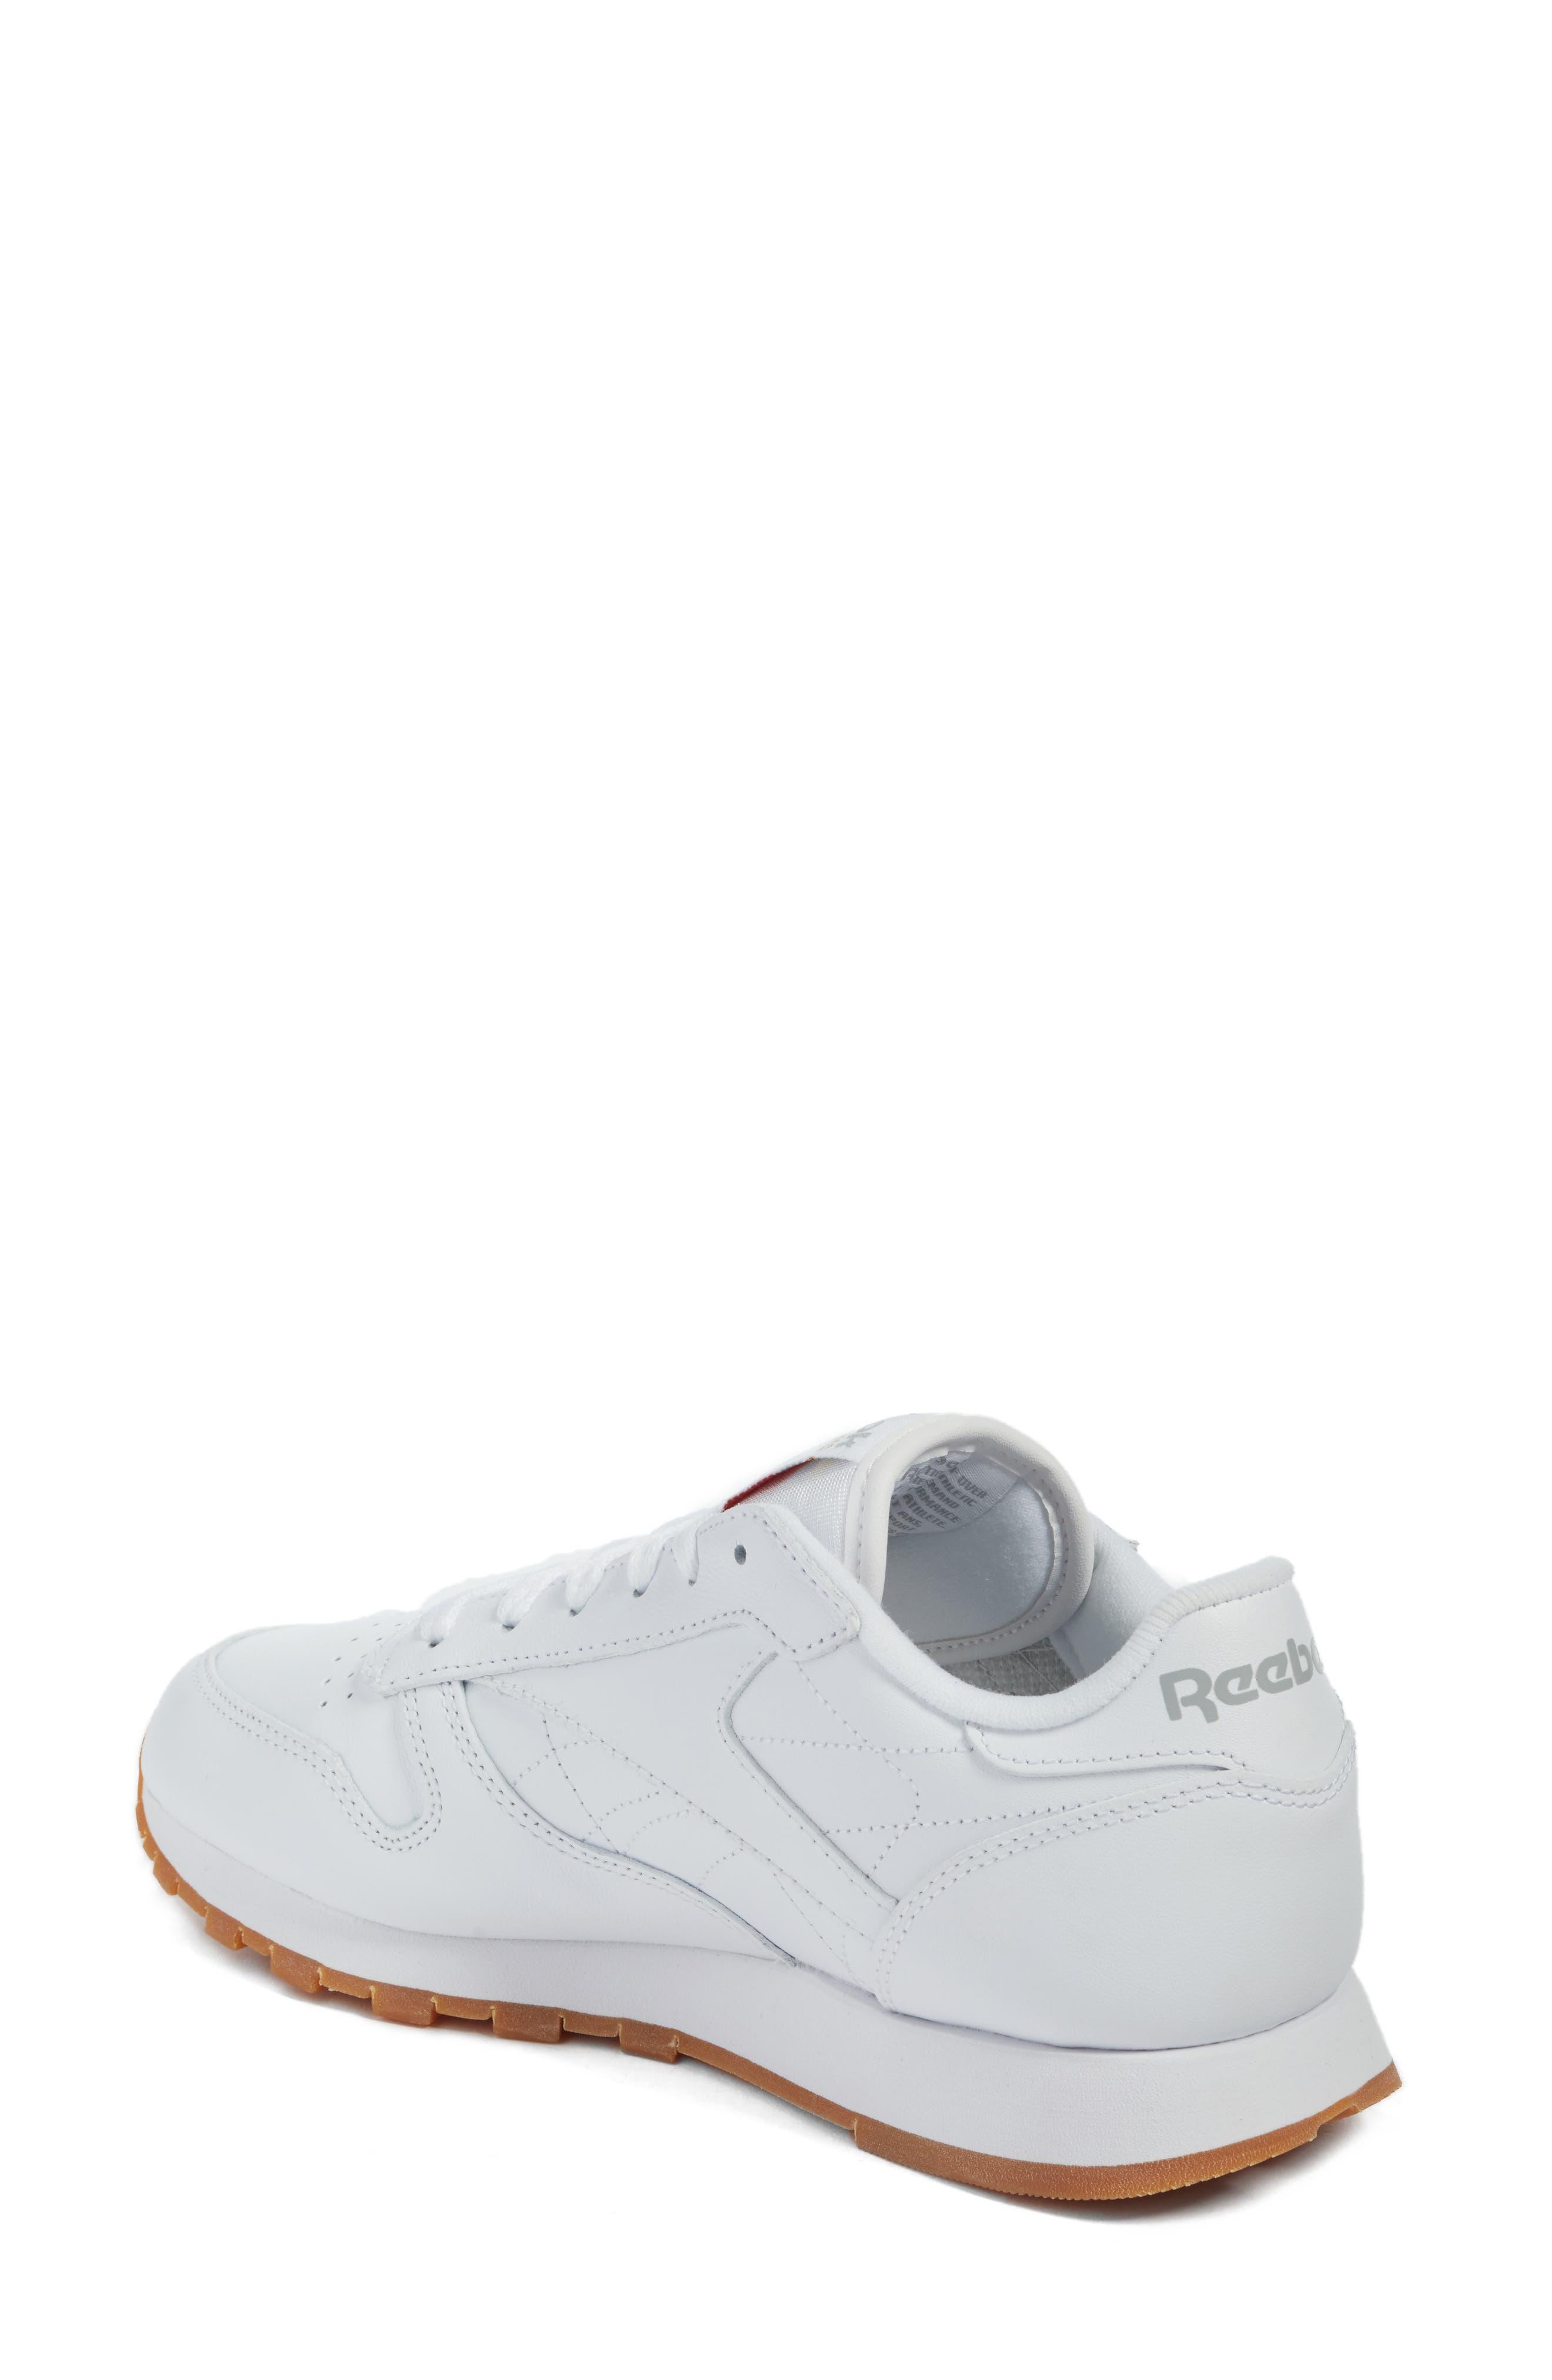 REEBOK, Classic Leather Sneaker, Alternate thumbnail 2, color, US-WHITE/ GUM